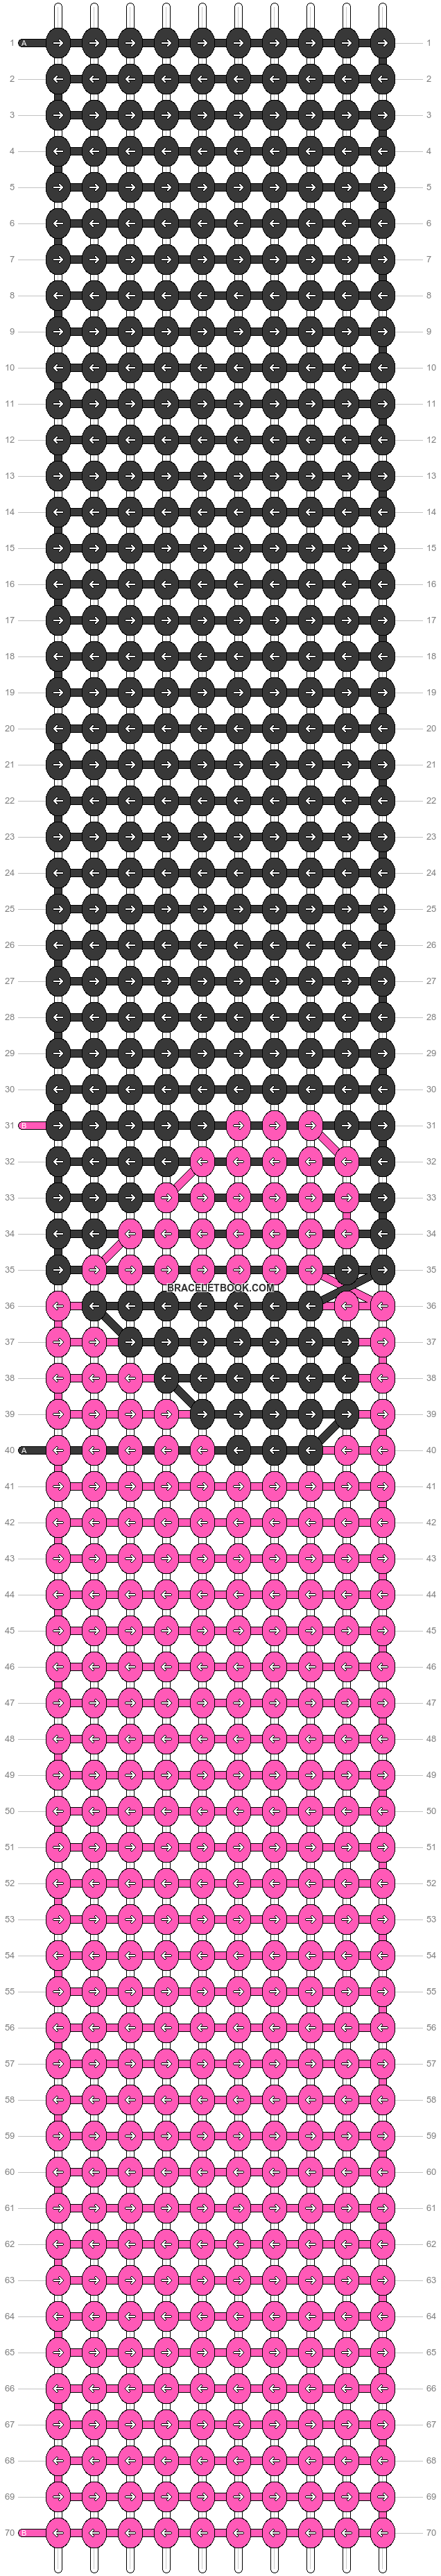 Alpha pattern #29052 pattern